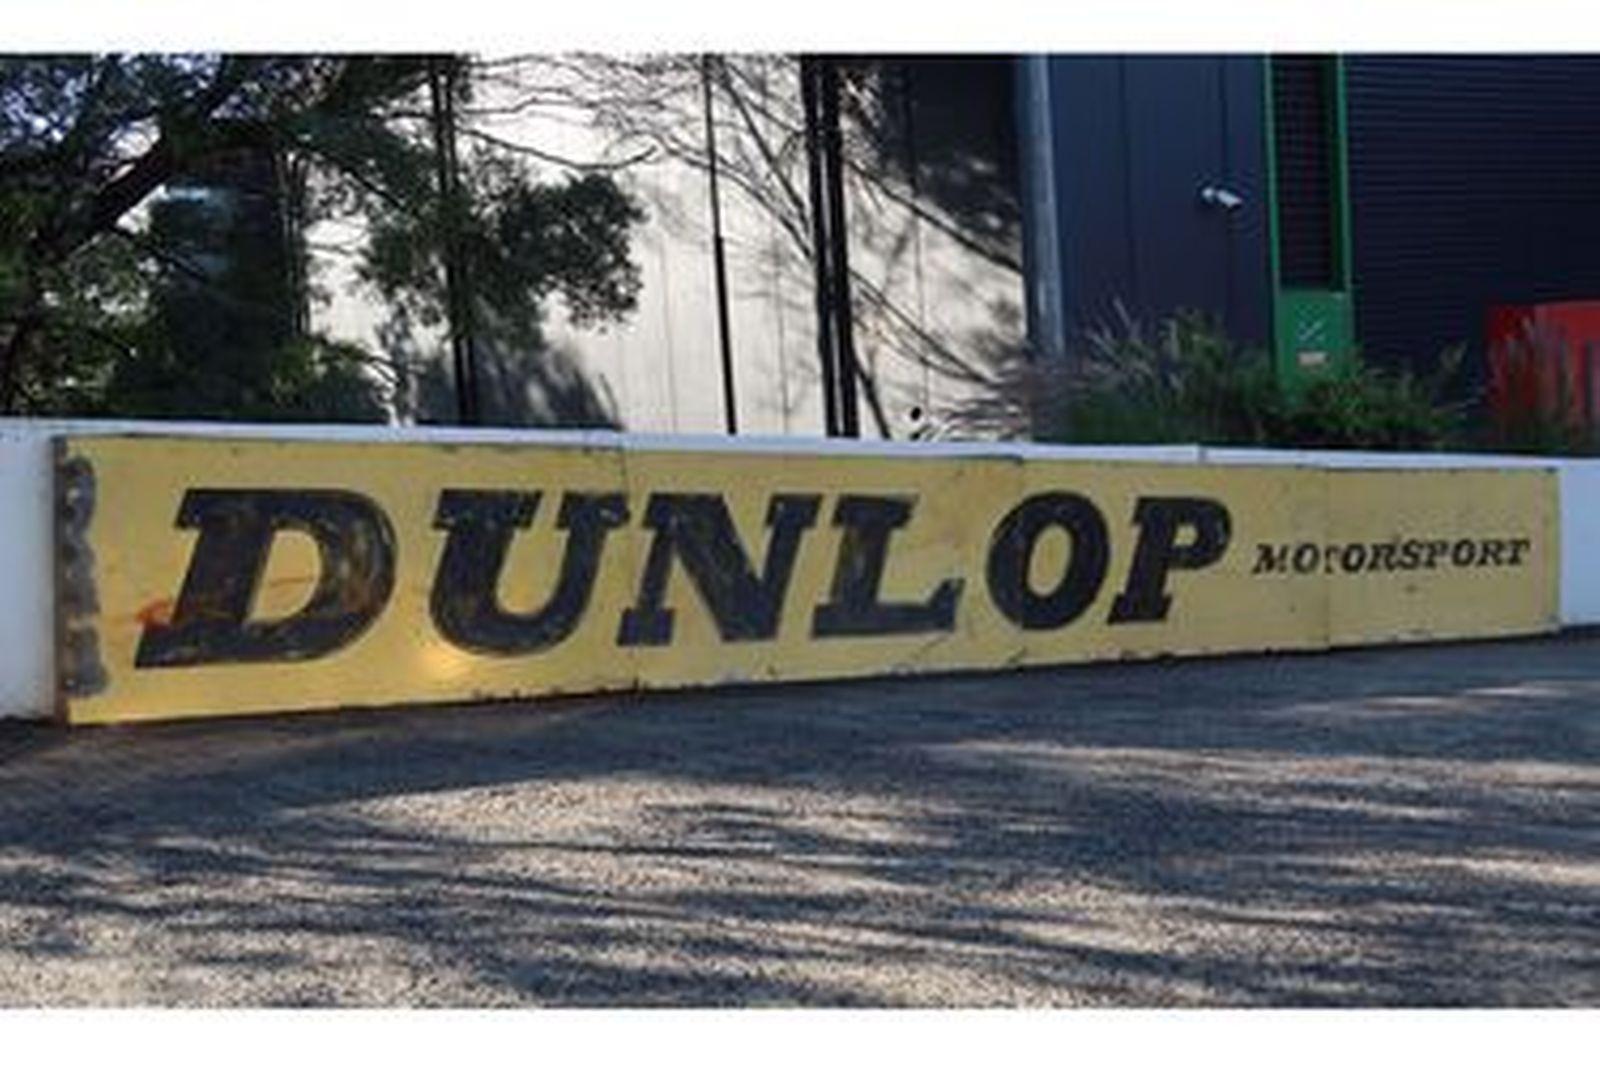 Tin Sign - 'Dunlop Motorsport' (7.4 x 0.85m)